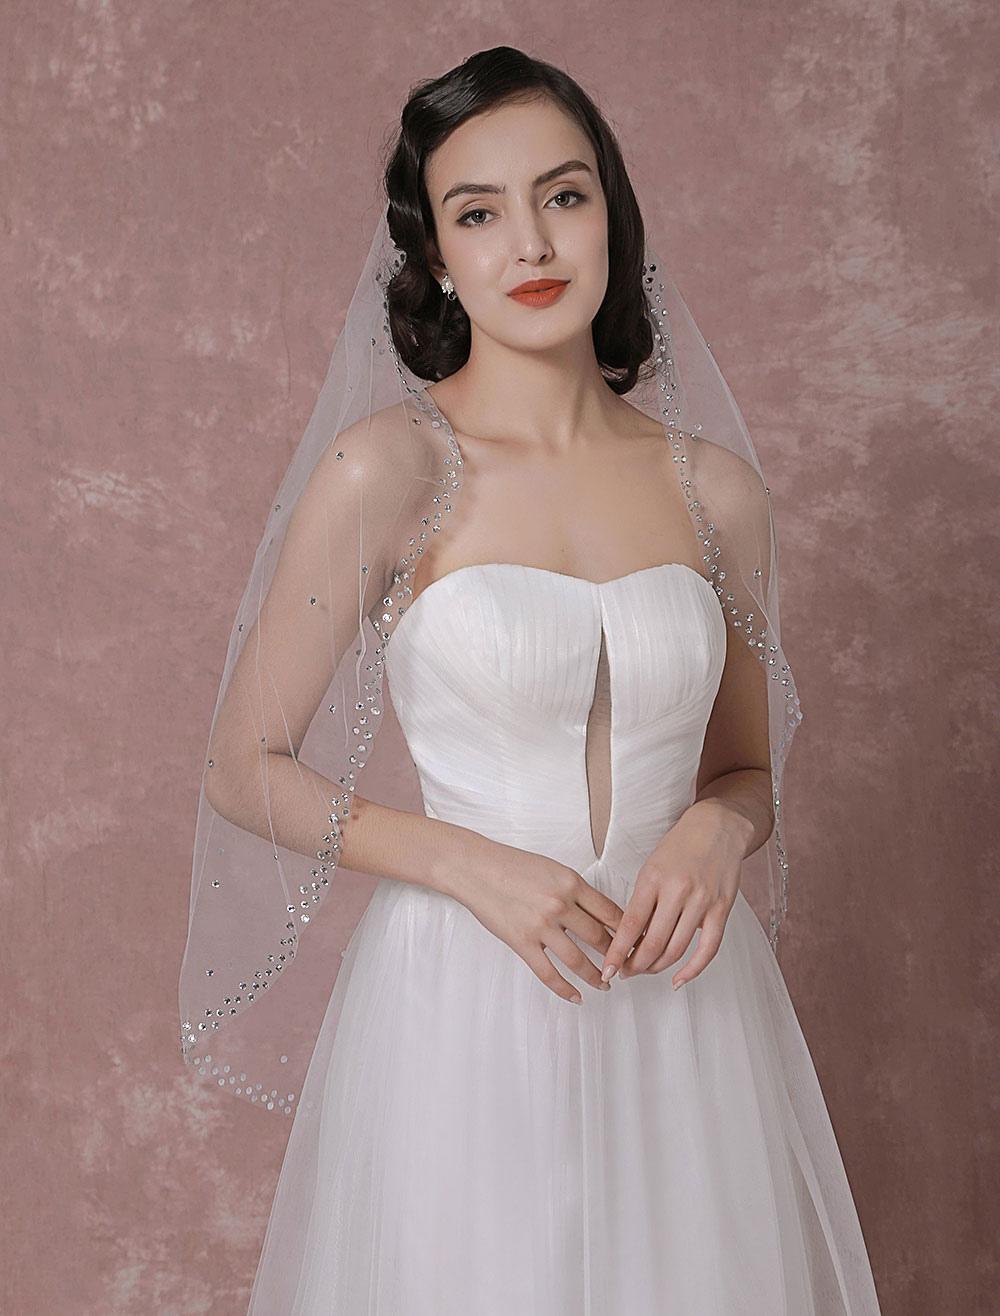 Buy Tulle Wedding Veil 1-Tier Beaded Edge Bridal Veil for $25.64 in Milanoo store